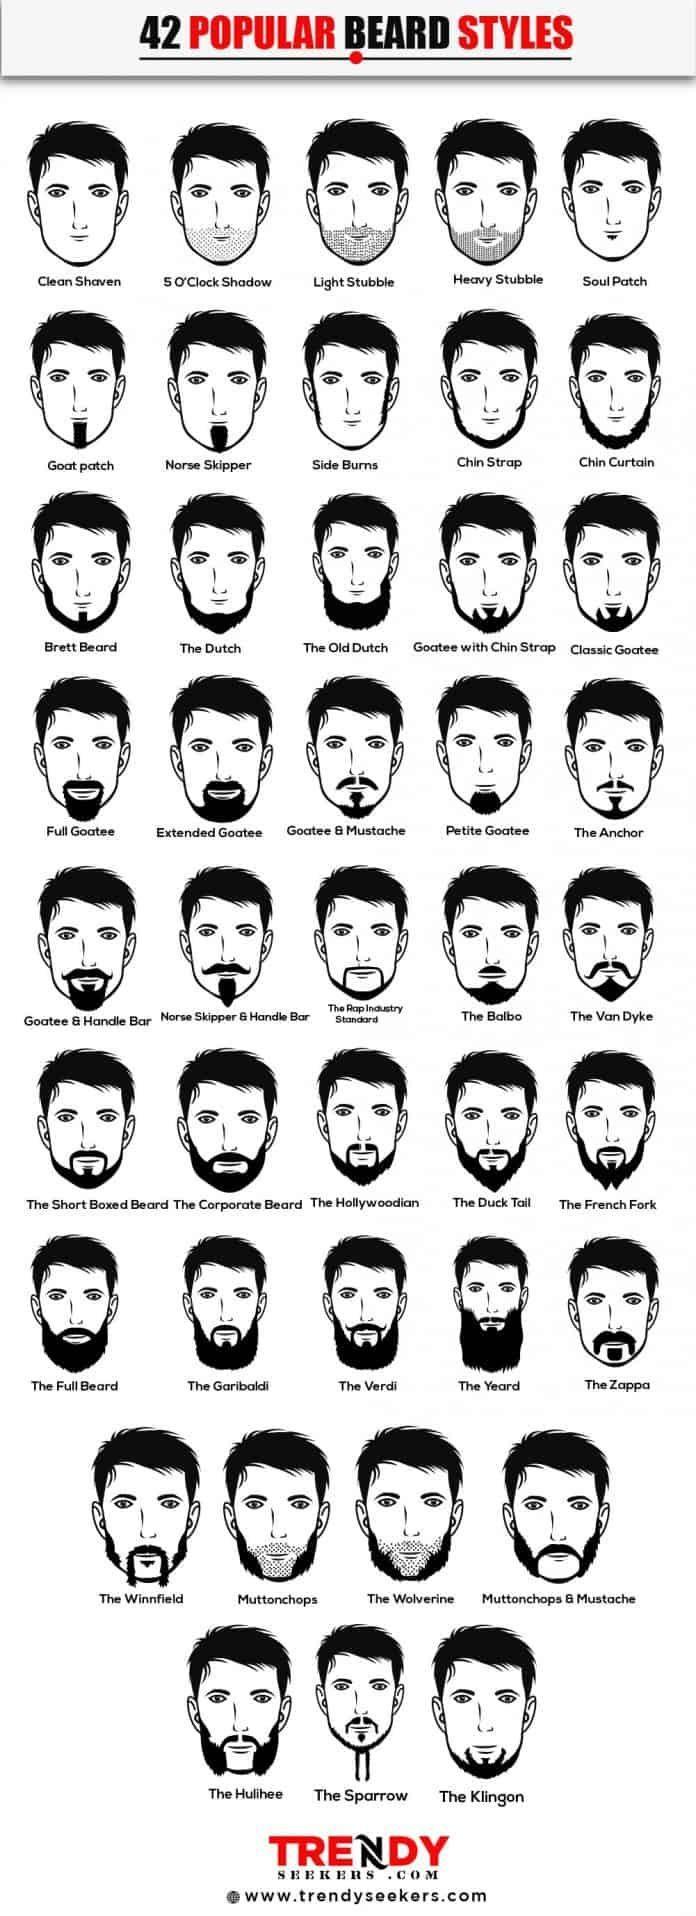 Photo of How to Grow A Beard – The 42 Beard Styles (2019) [ULTIMATE GUIDE] #Beards #Beard…